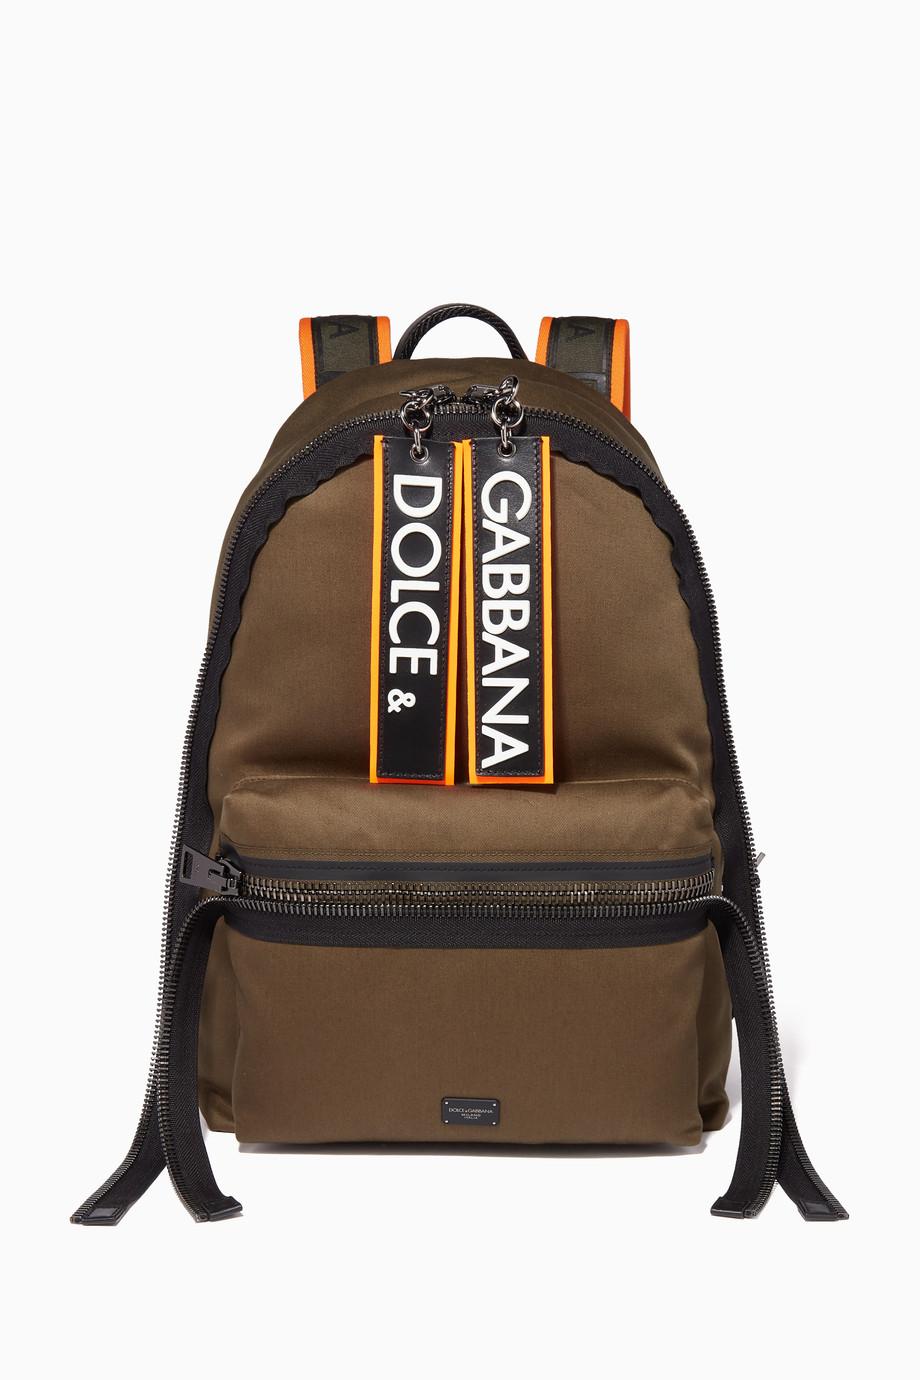 152c6416d6 Shop Dolce & Gabbana Green Dark Green Canvas Tape Backpack for Men ...